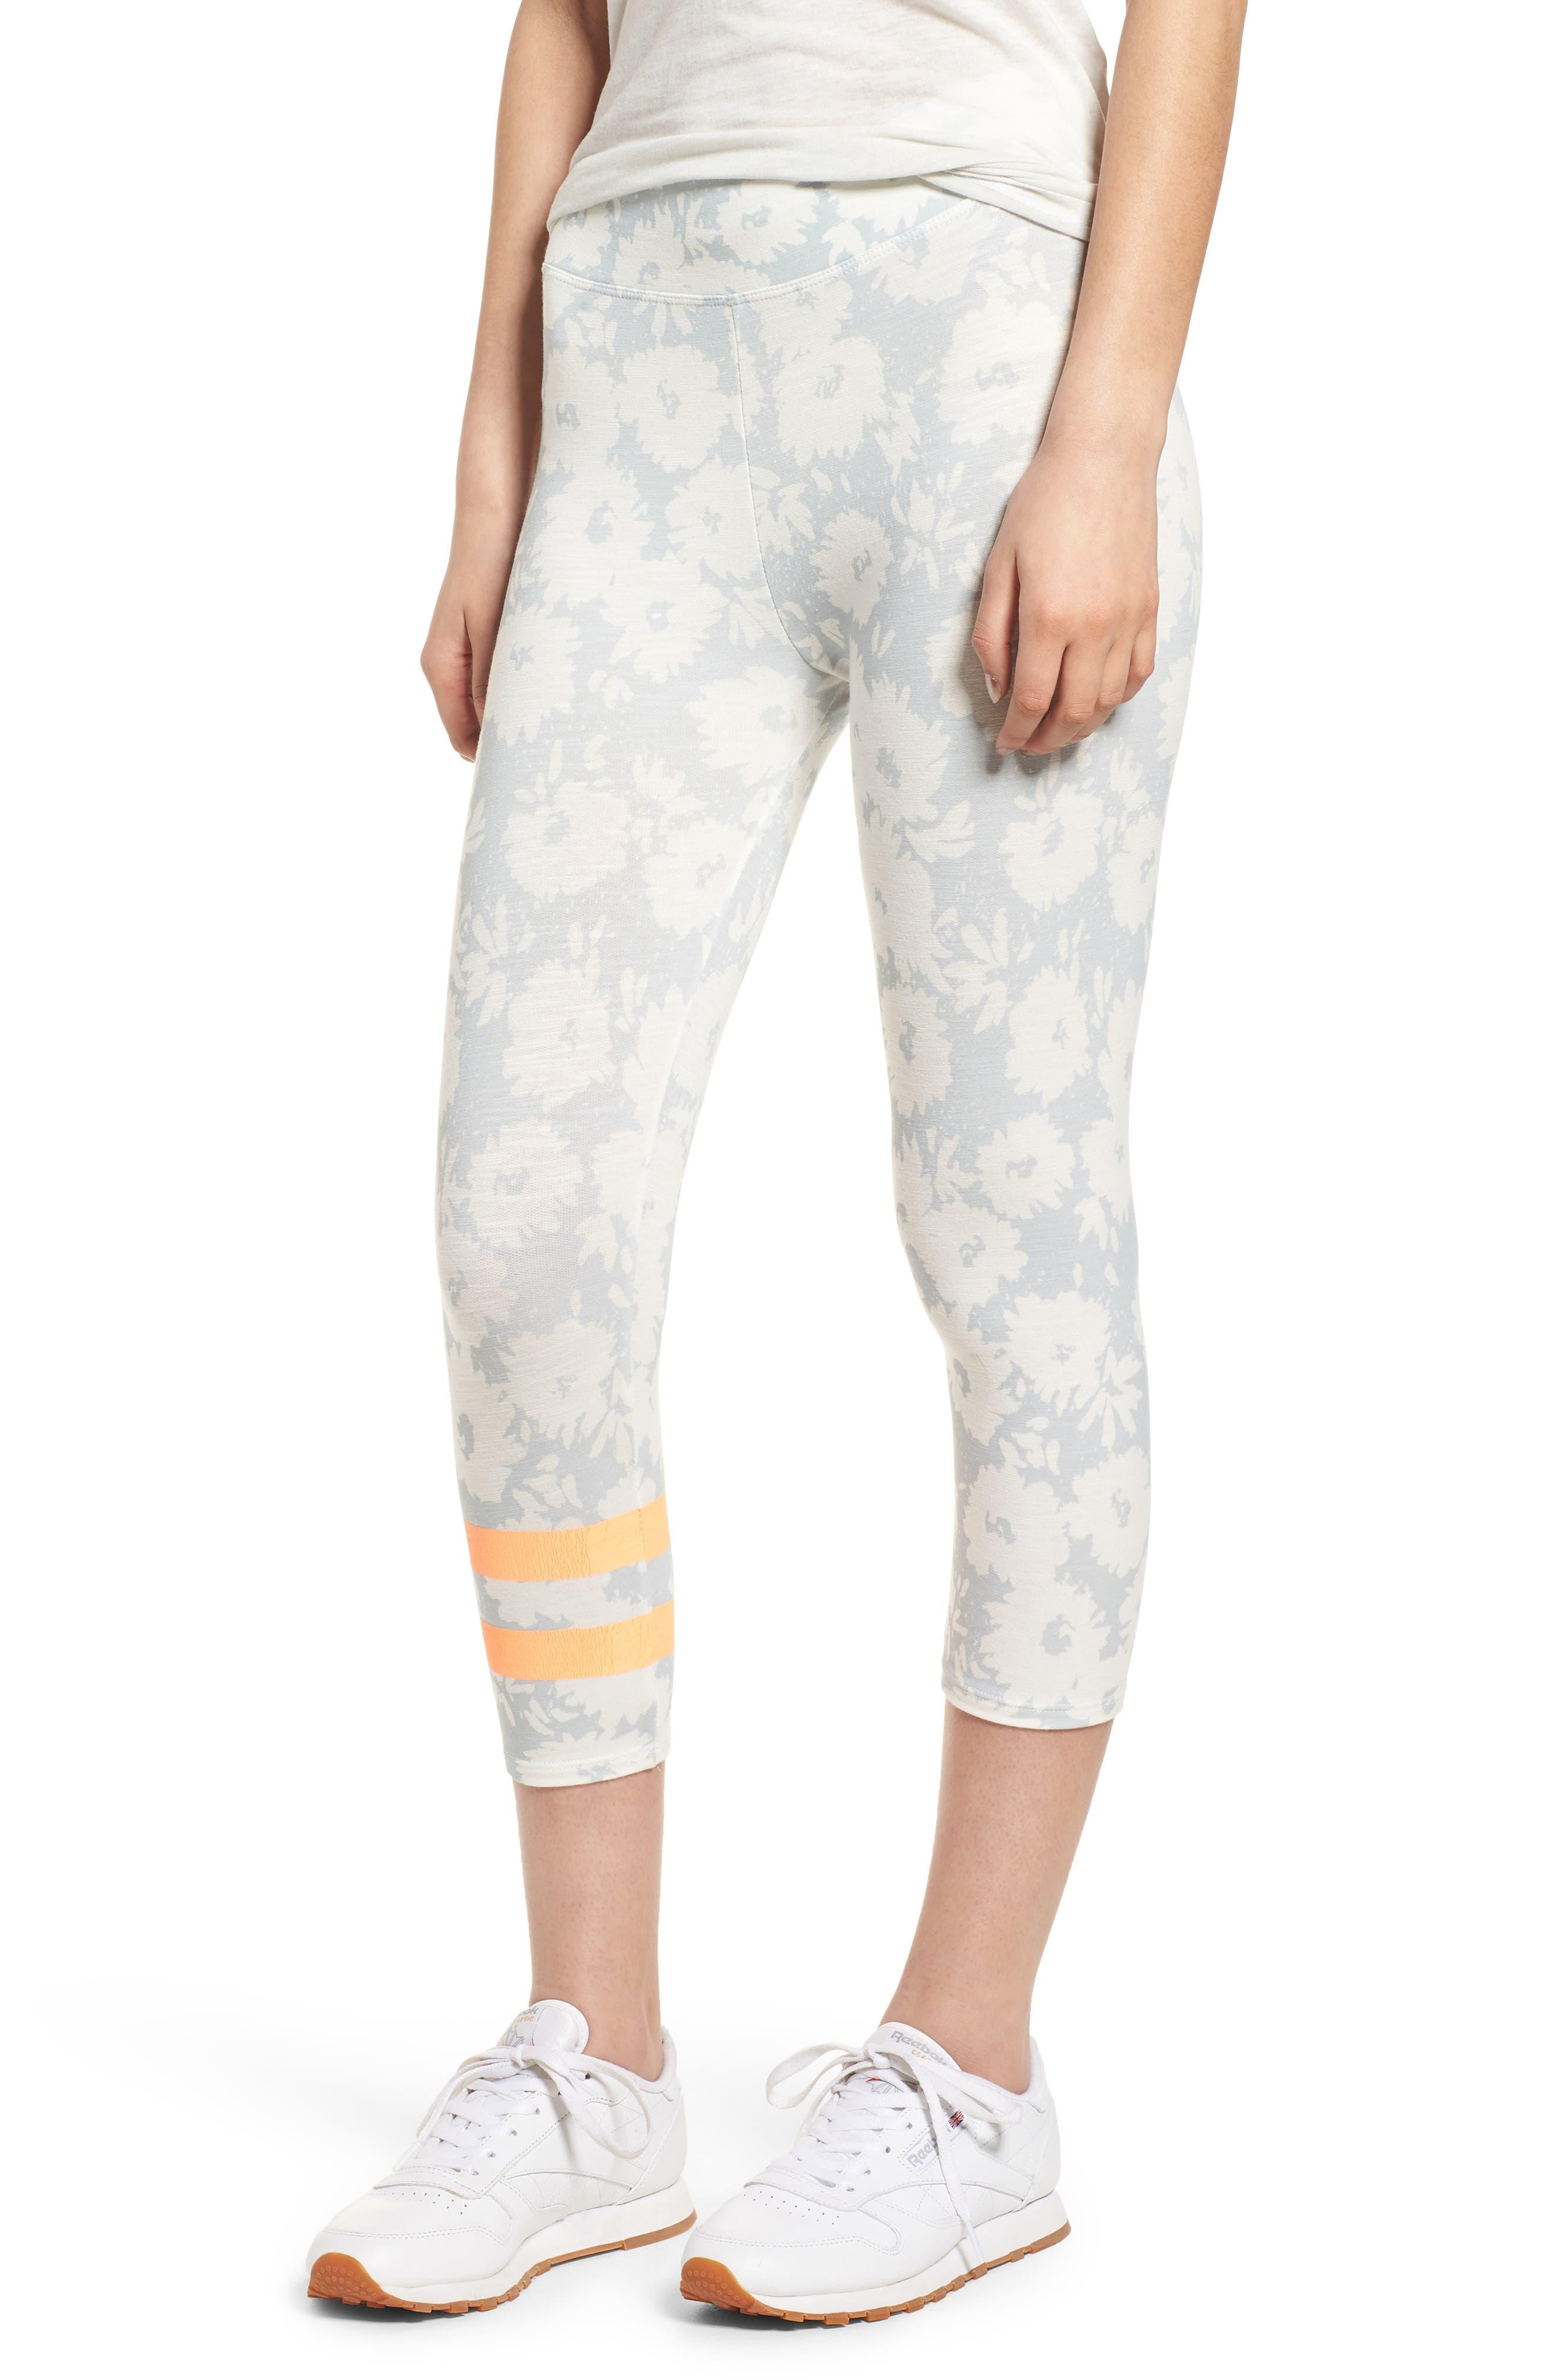 Alternate Image 1 Selected - Sundry Stripe Print Capri Yoga Pants